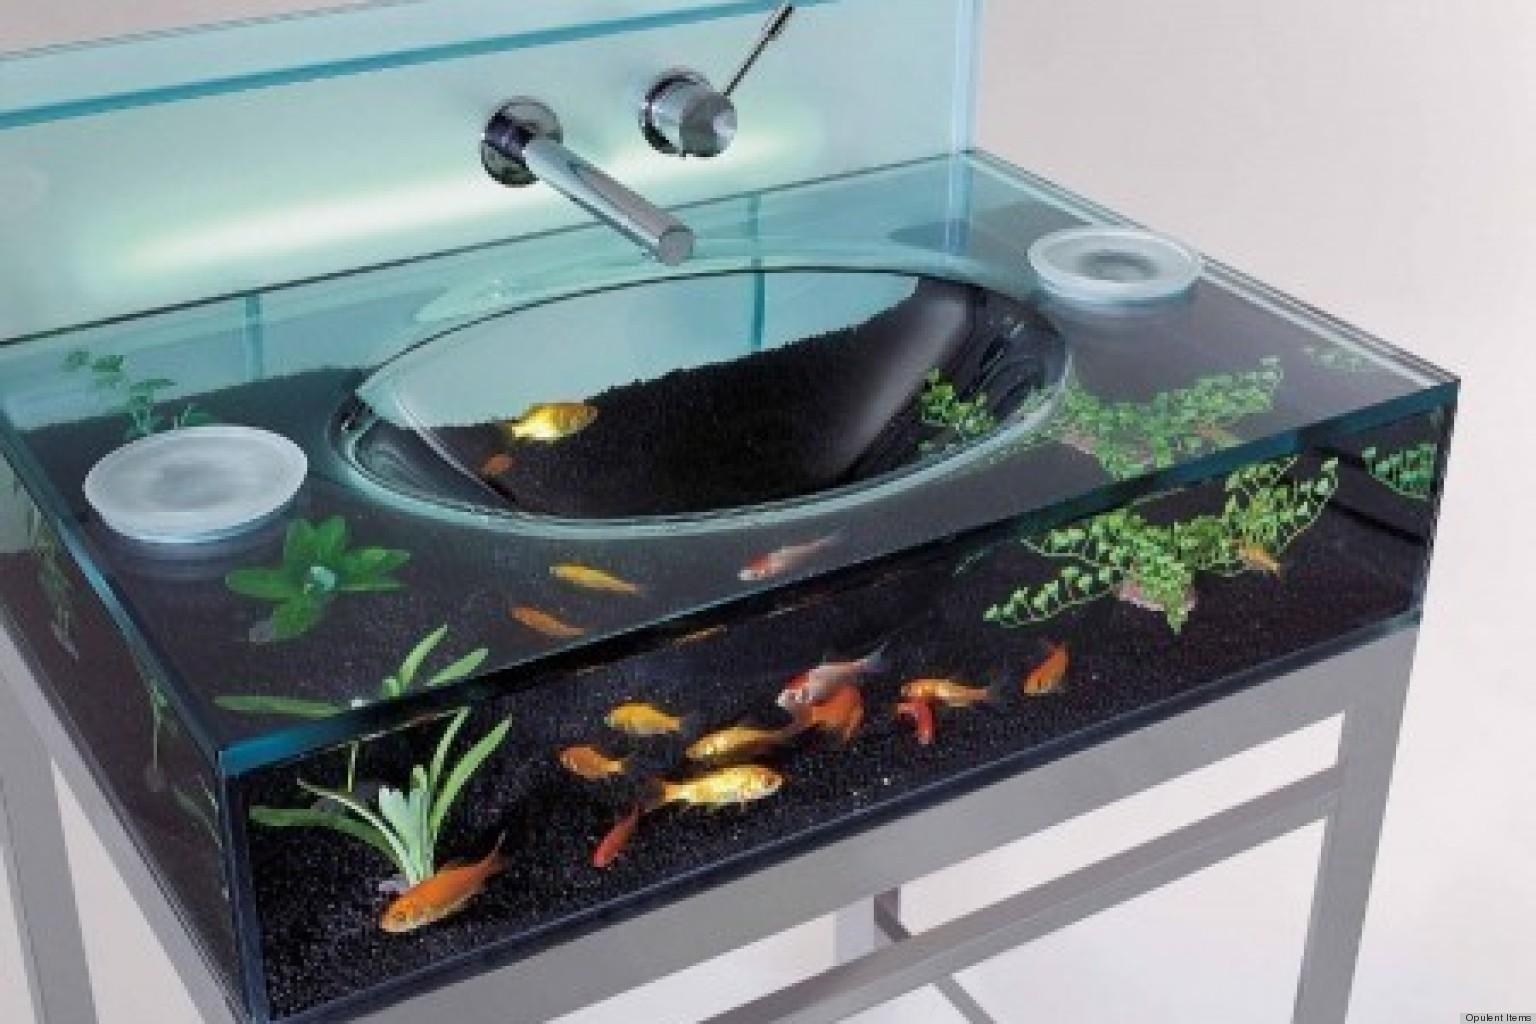 Aquarium fish tank cover - Aquarium Fish Tank Cover